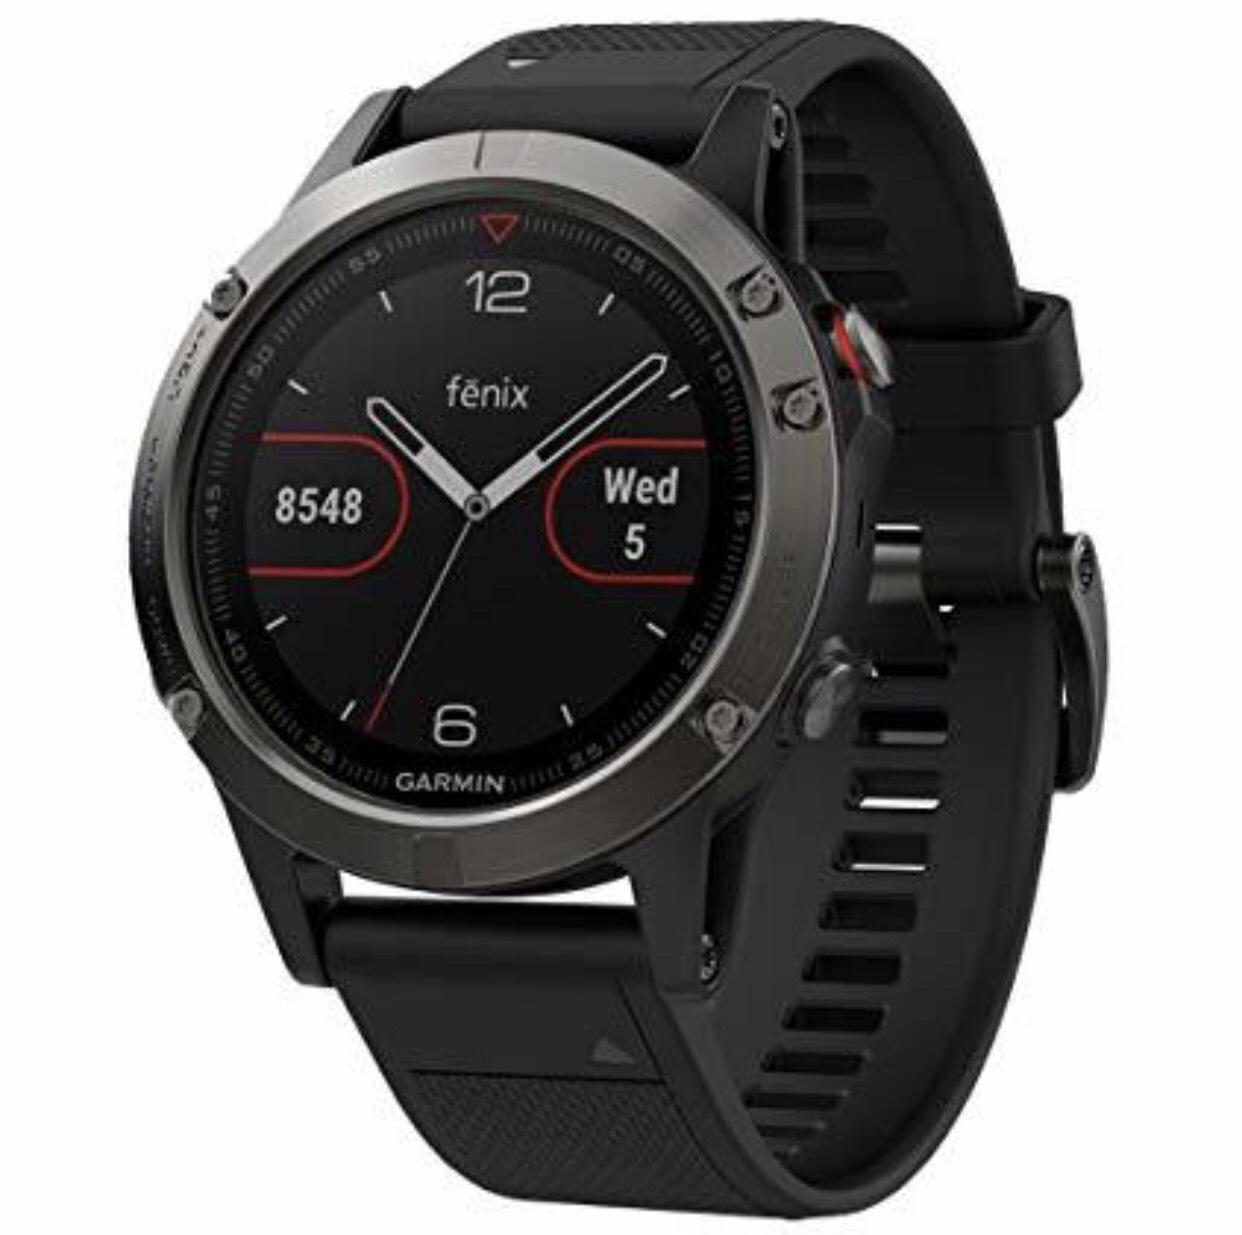 Reloj deportivo - Garmin Fenix 5 a 349€